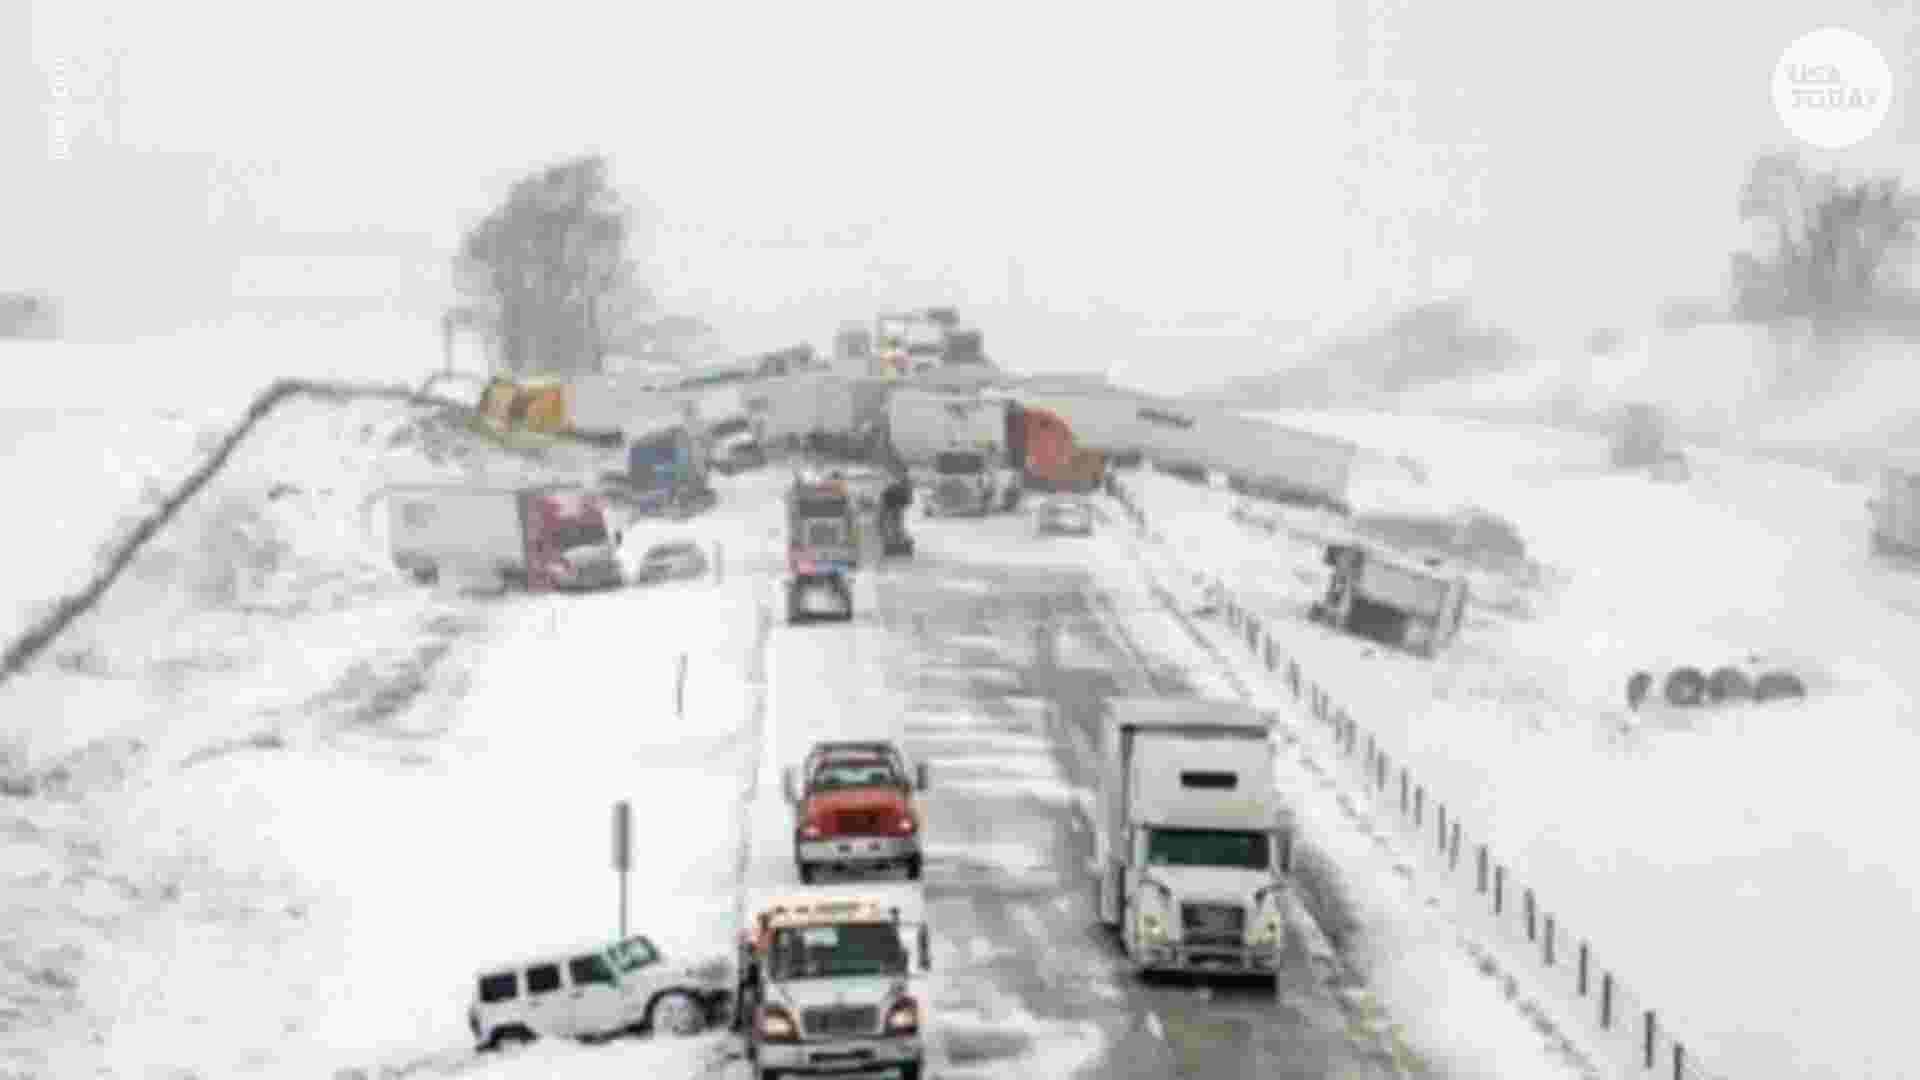 Winter weather causes 'massive' 40-car pileup in Iowa thumbnail